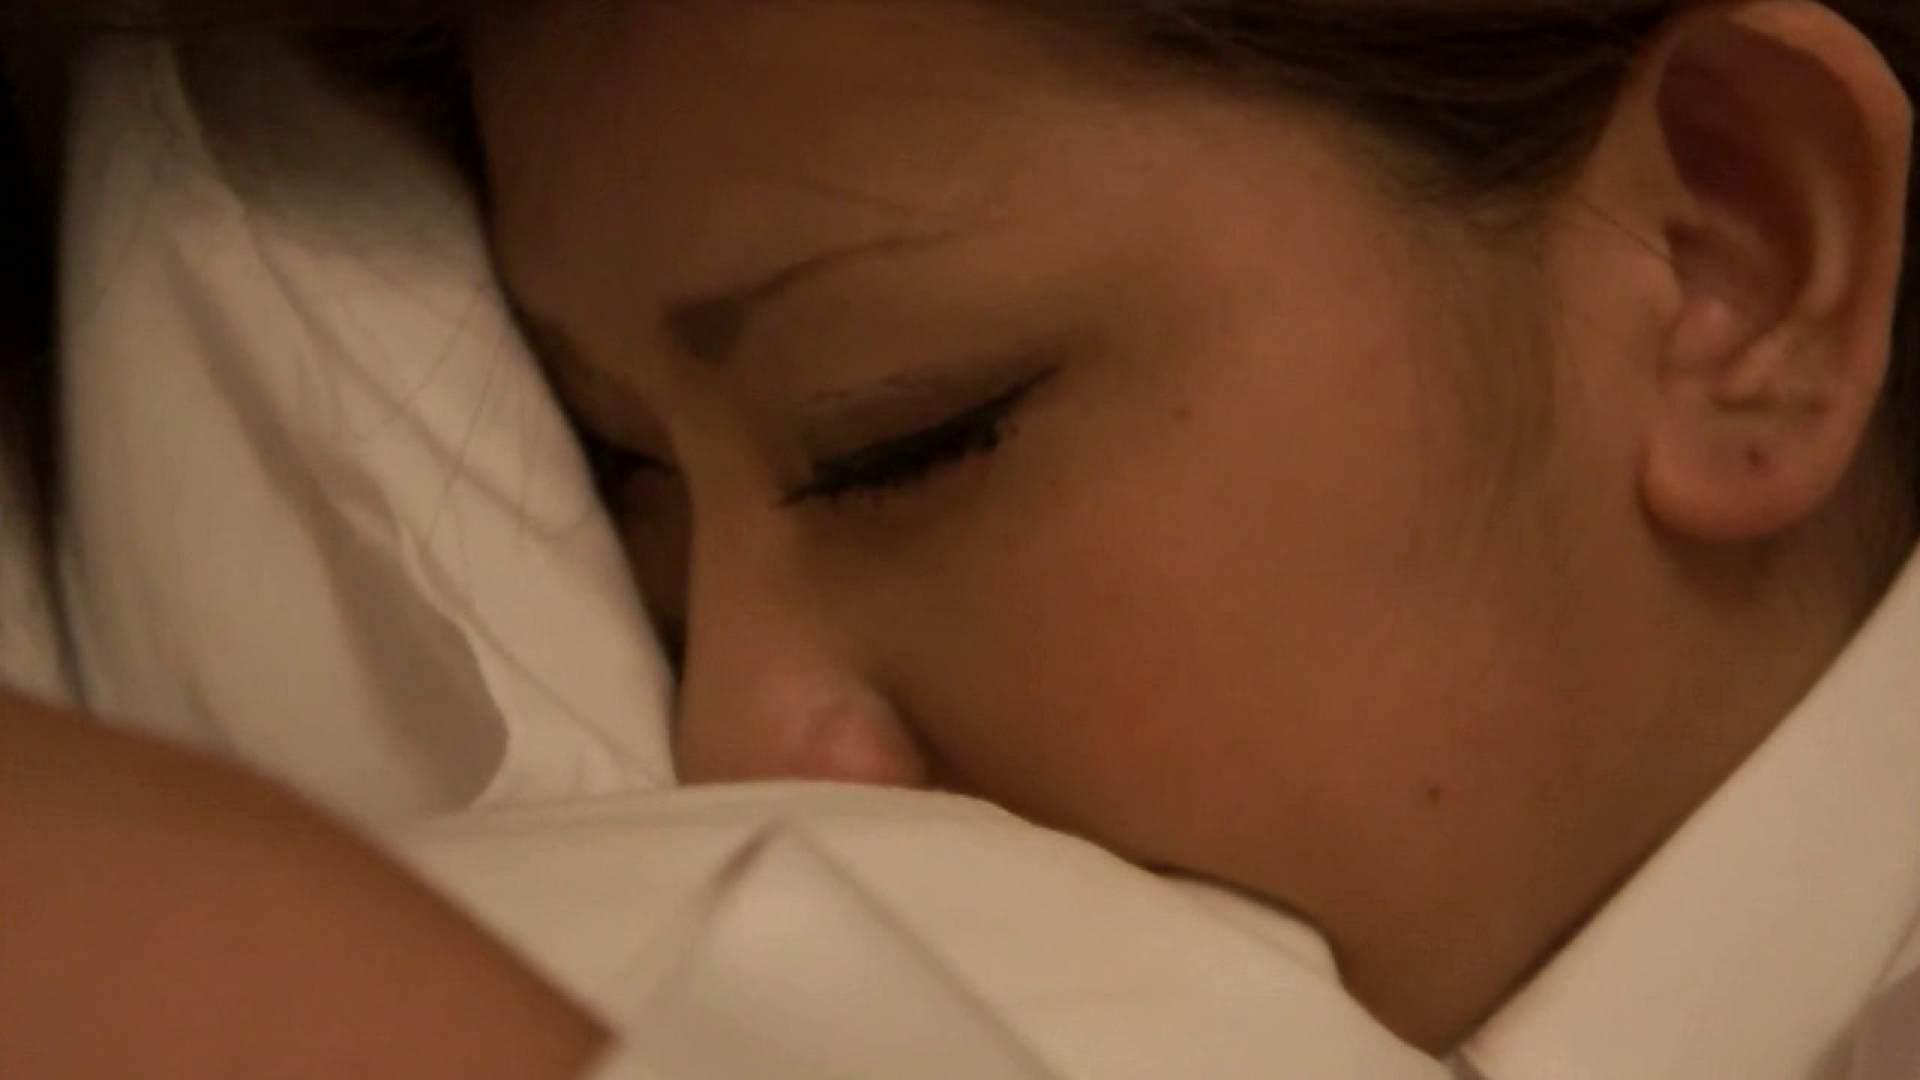 vol.8 【Mちゃん(2回目)】ブランド品査定士19歳 花子とも仲良し イタズラ特集   ギャル盗撮映像  89PIX 1